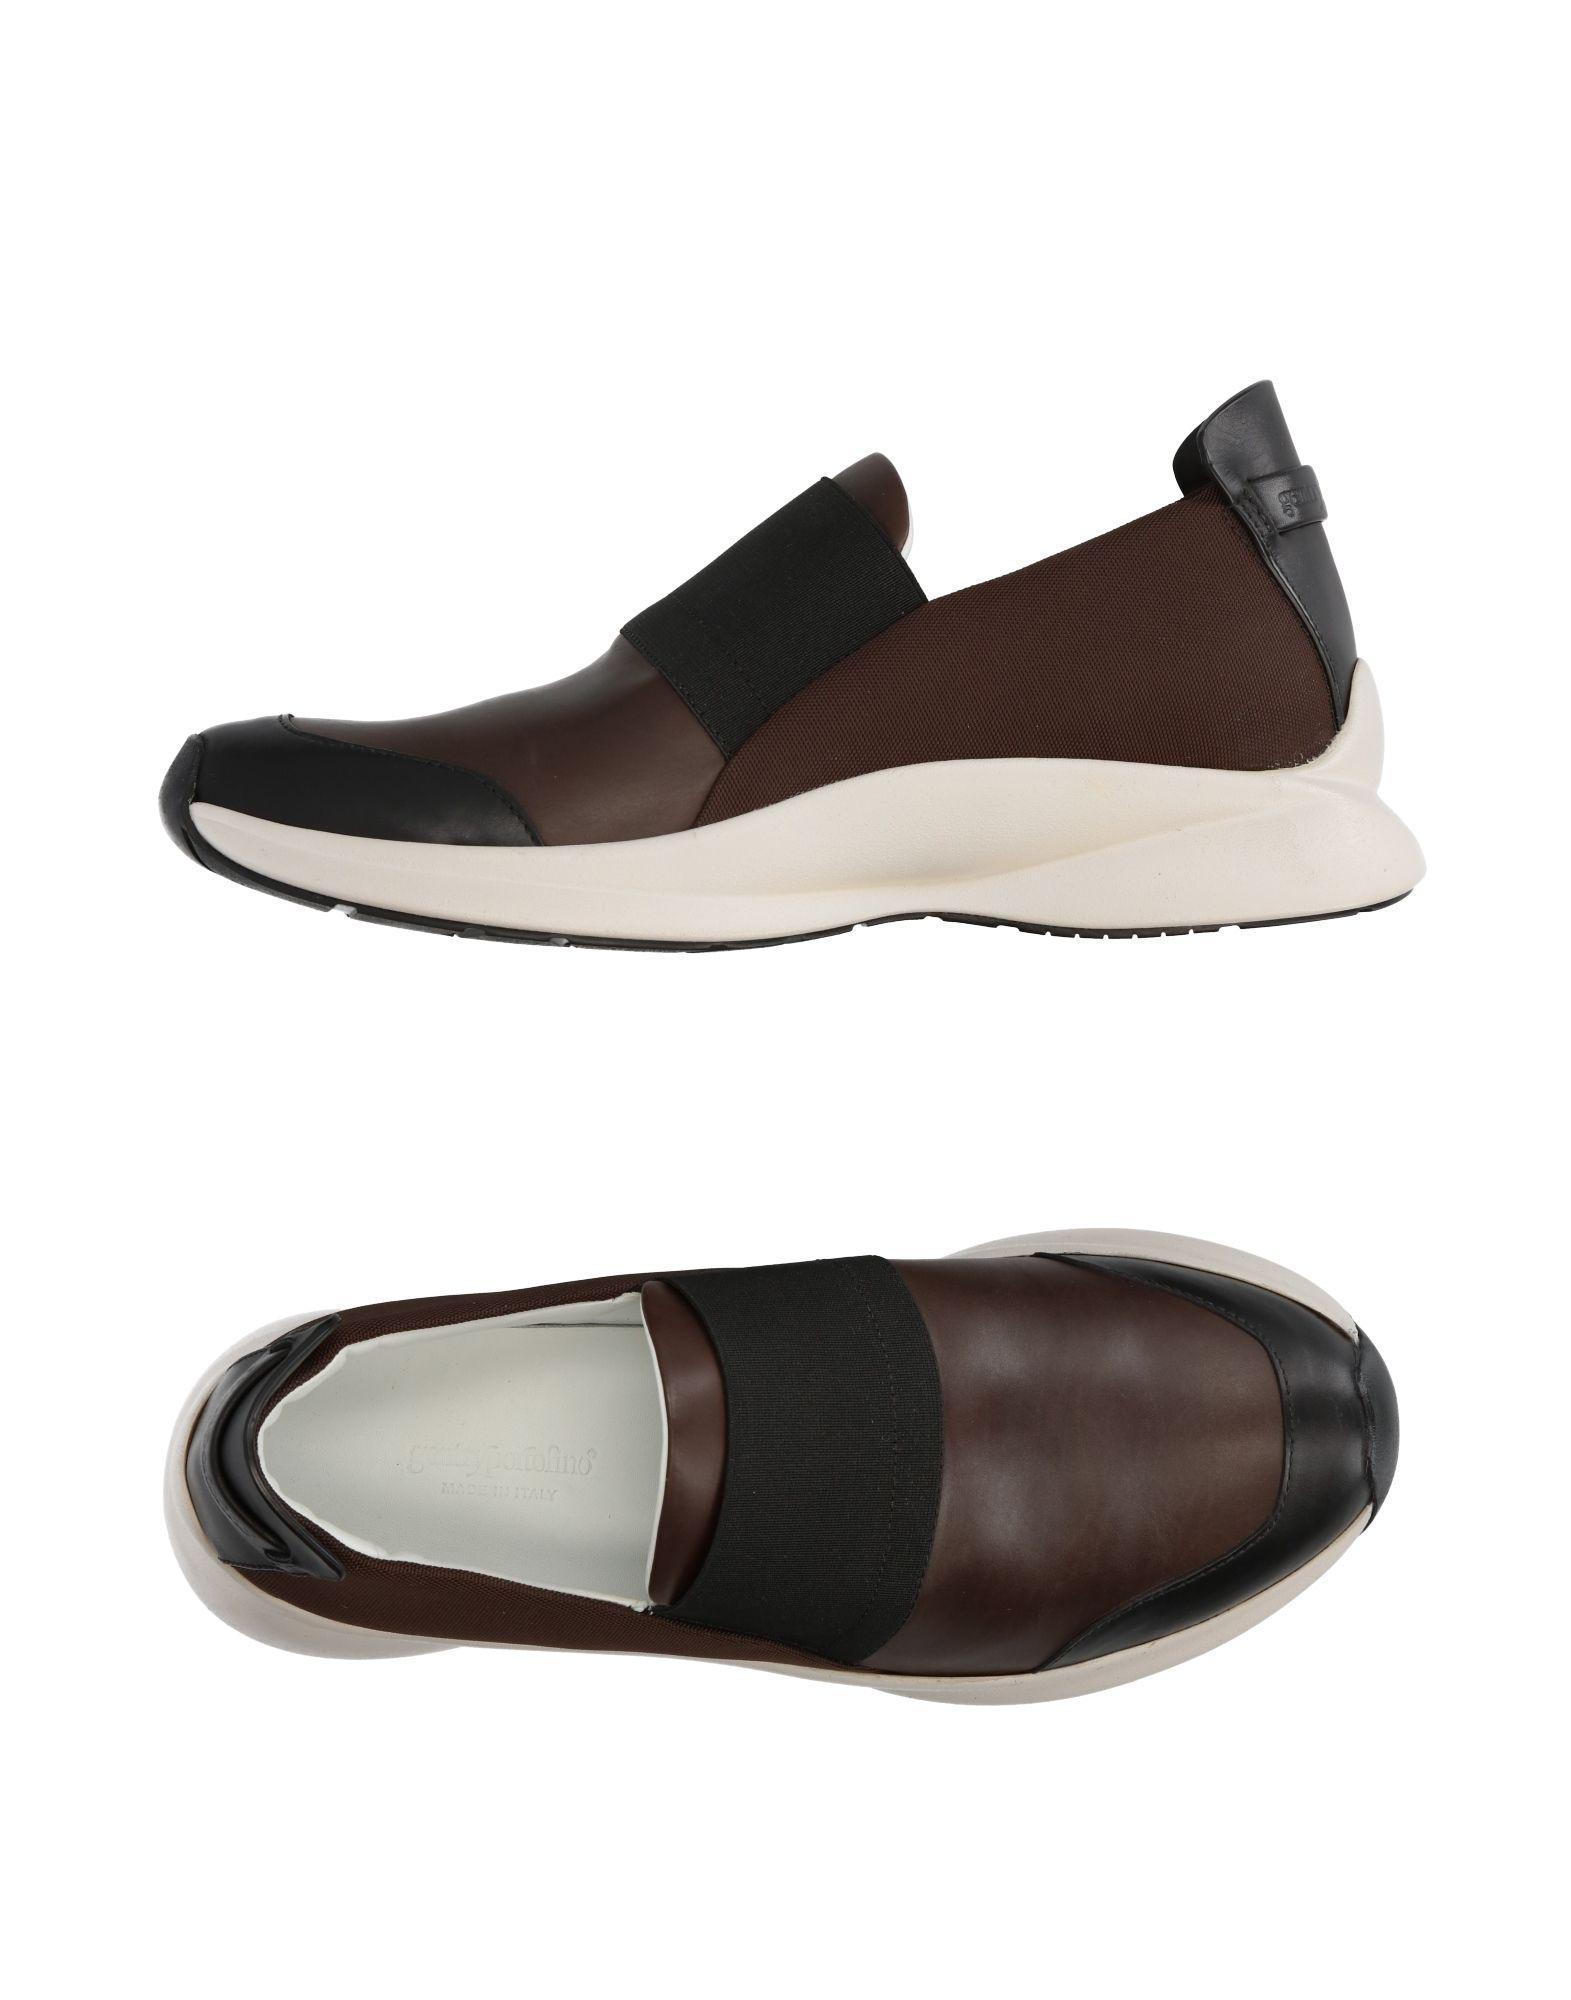 Gentryportofino Bas-tops Et Chaussures De Sport ICfNlpWkX